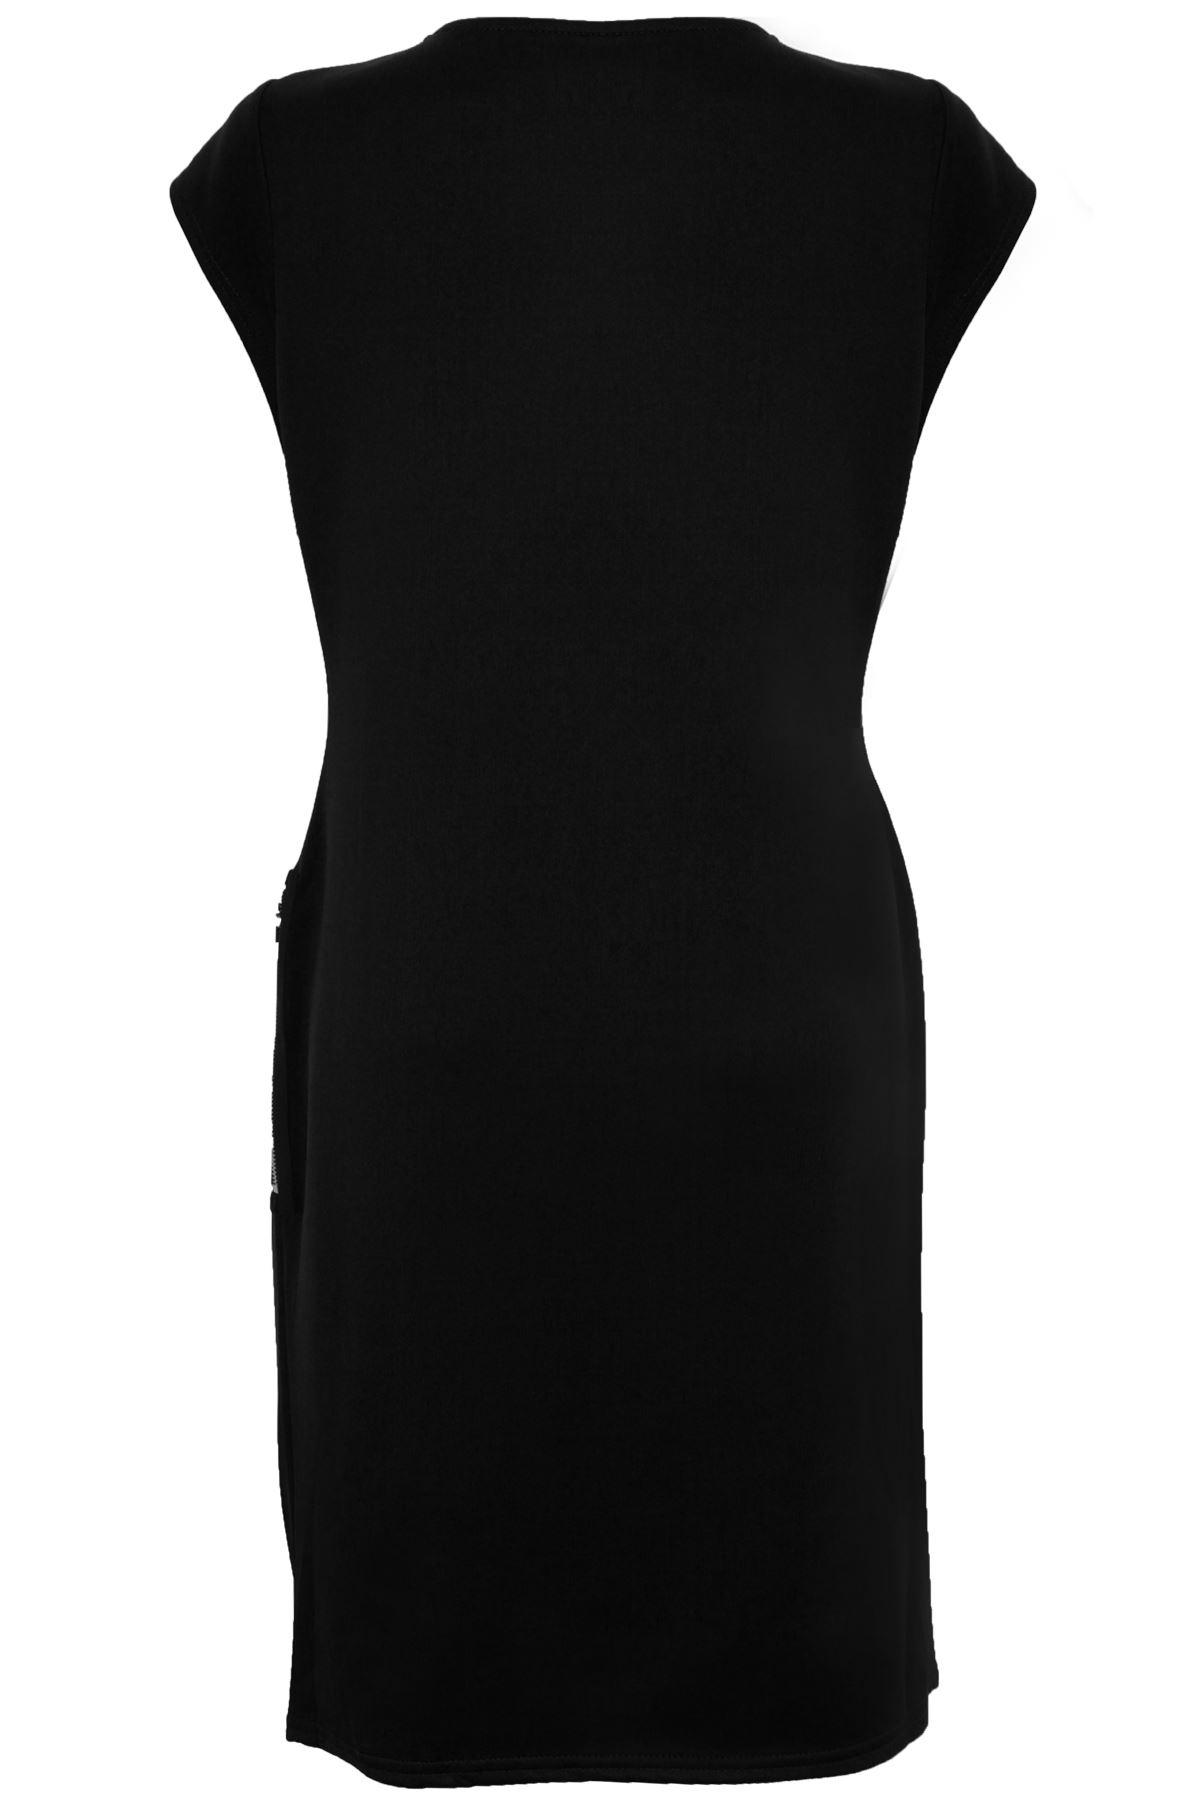 Women/'s Smart Plus Size Bodycon Ladies Cap Sleeve Side Zip Gathered Dress